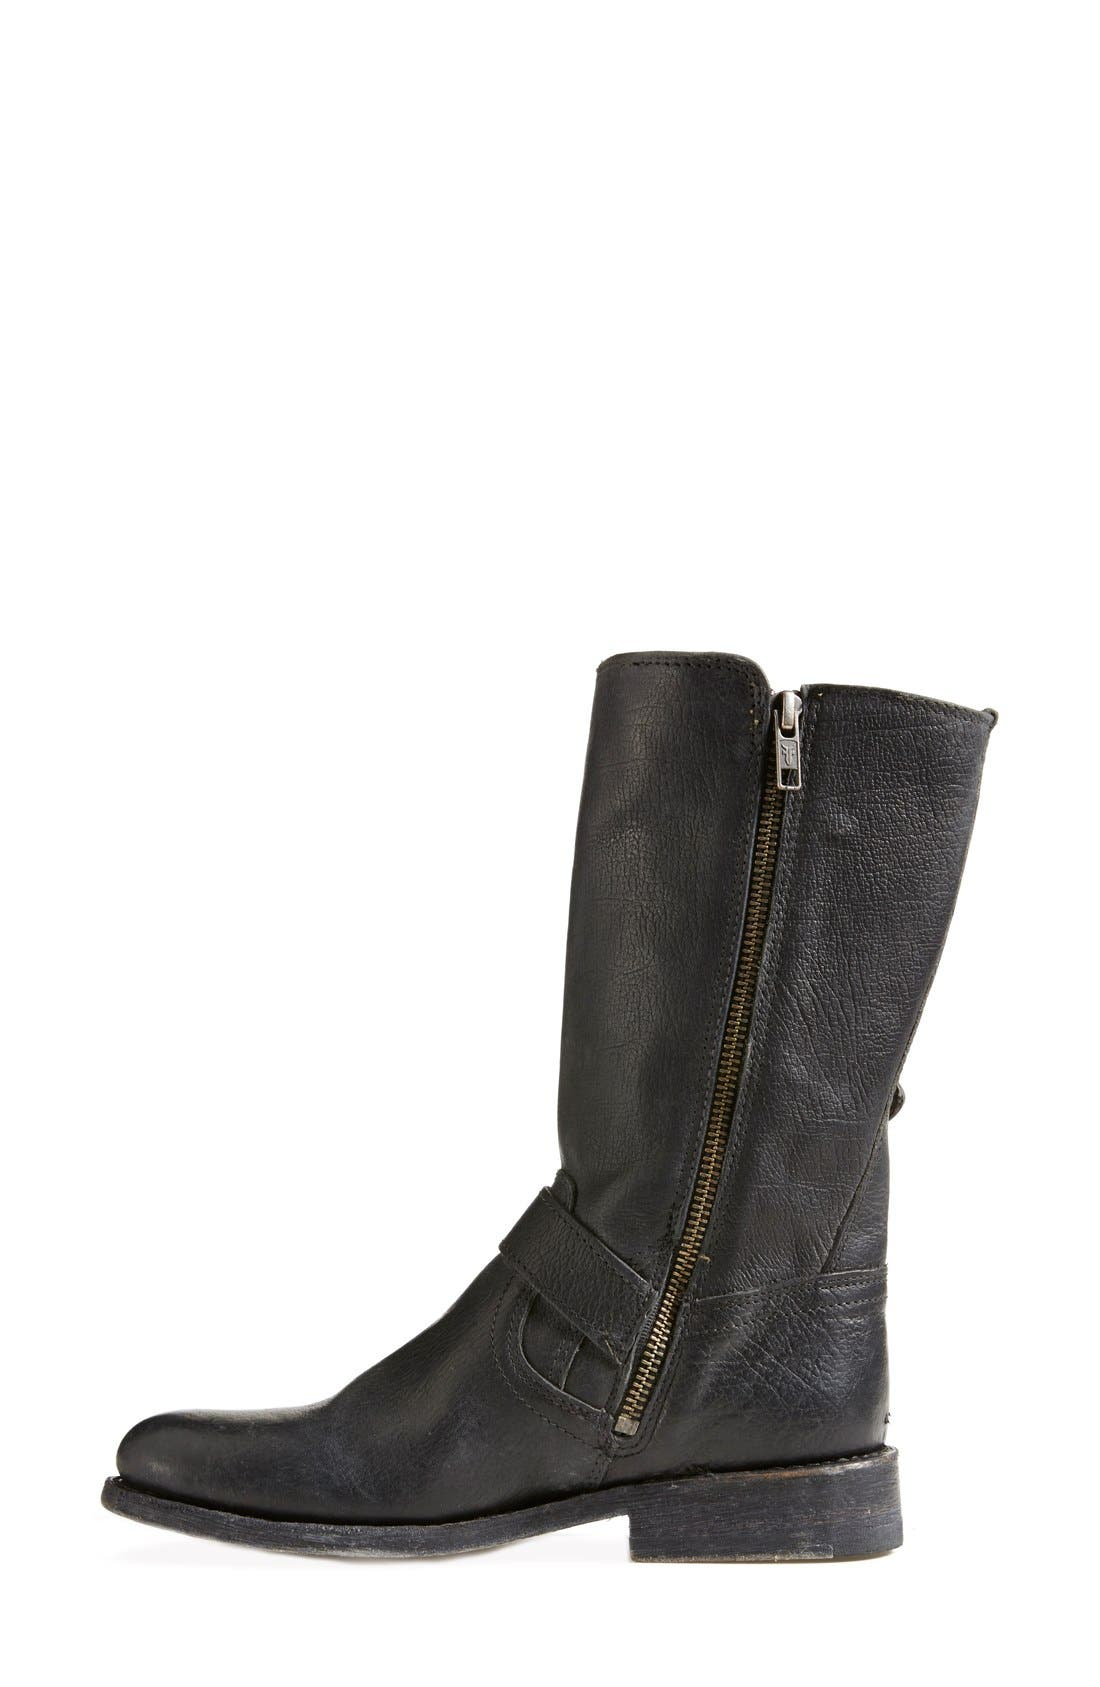 'Jayden' Leather Moto Boot,                             Alternate thumbnail 5, color,                             001